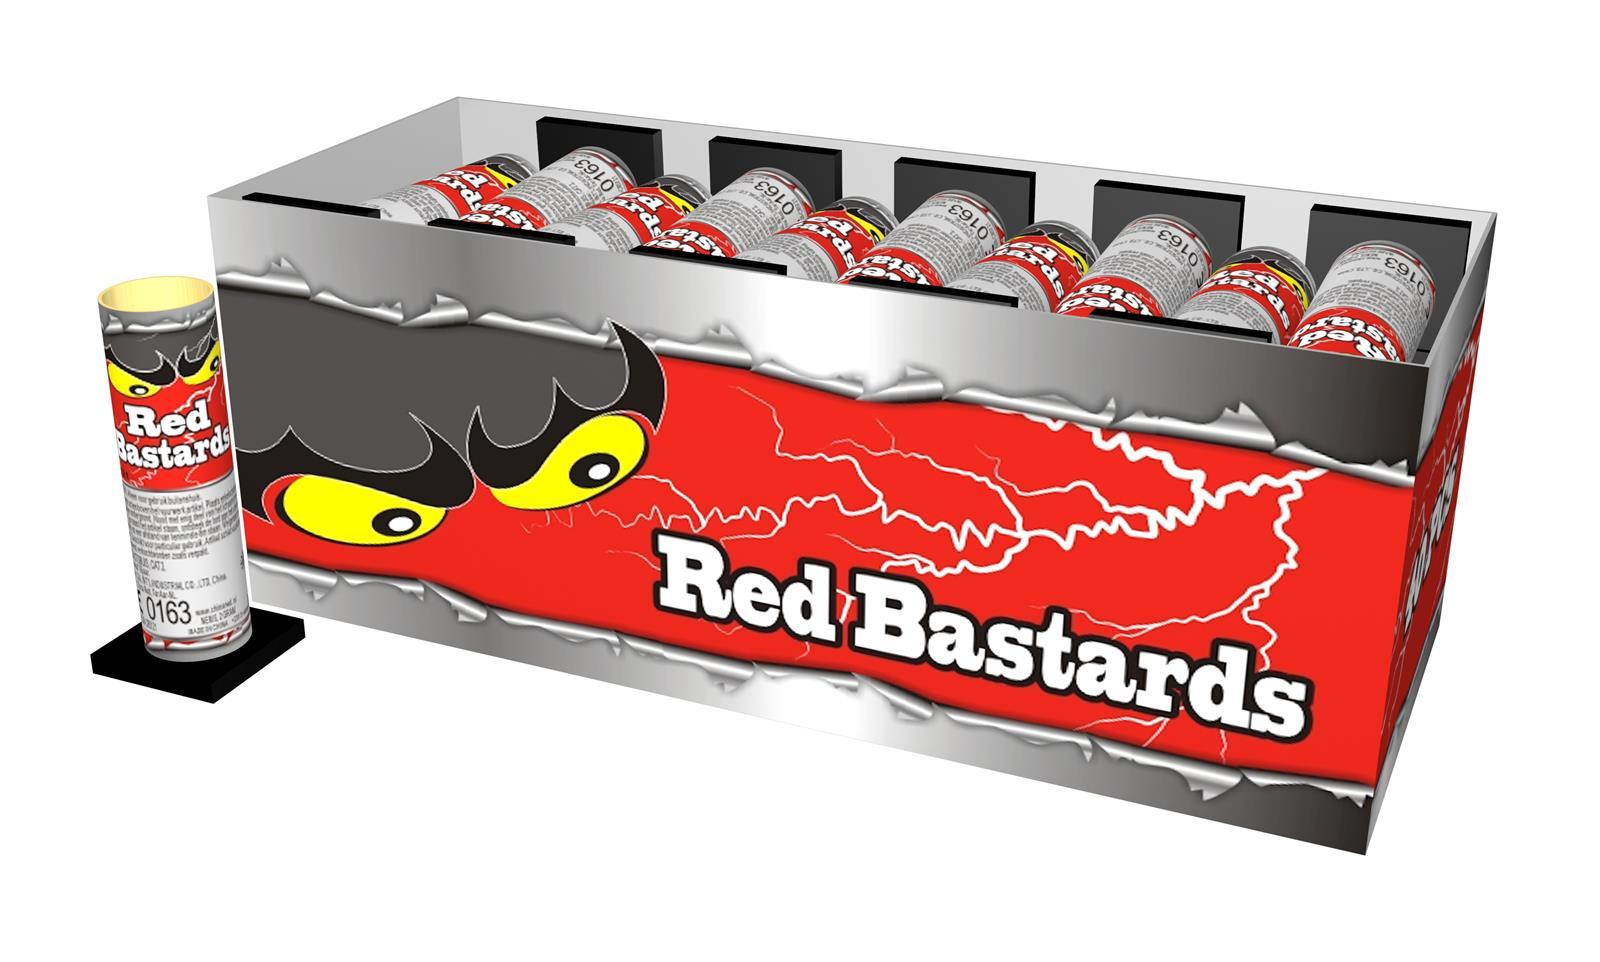 Red Bastards (40 stuks)*